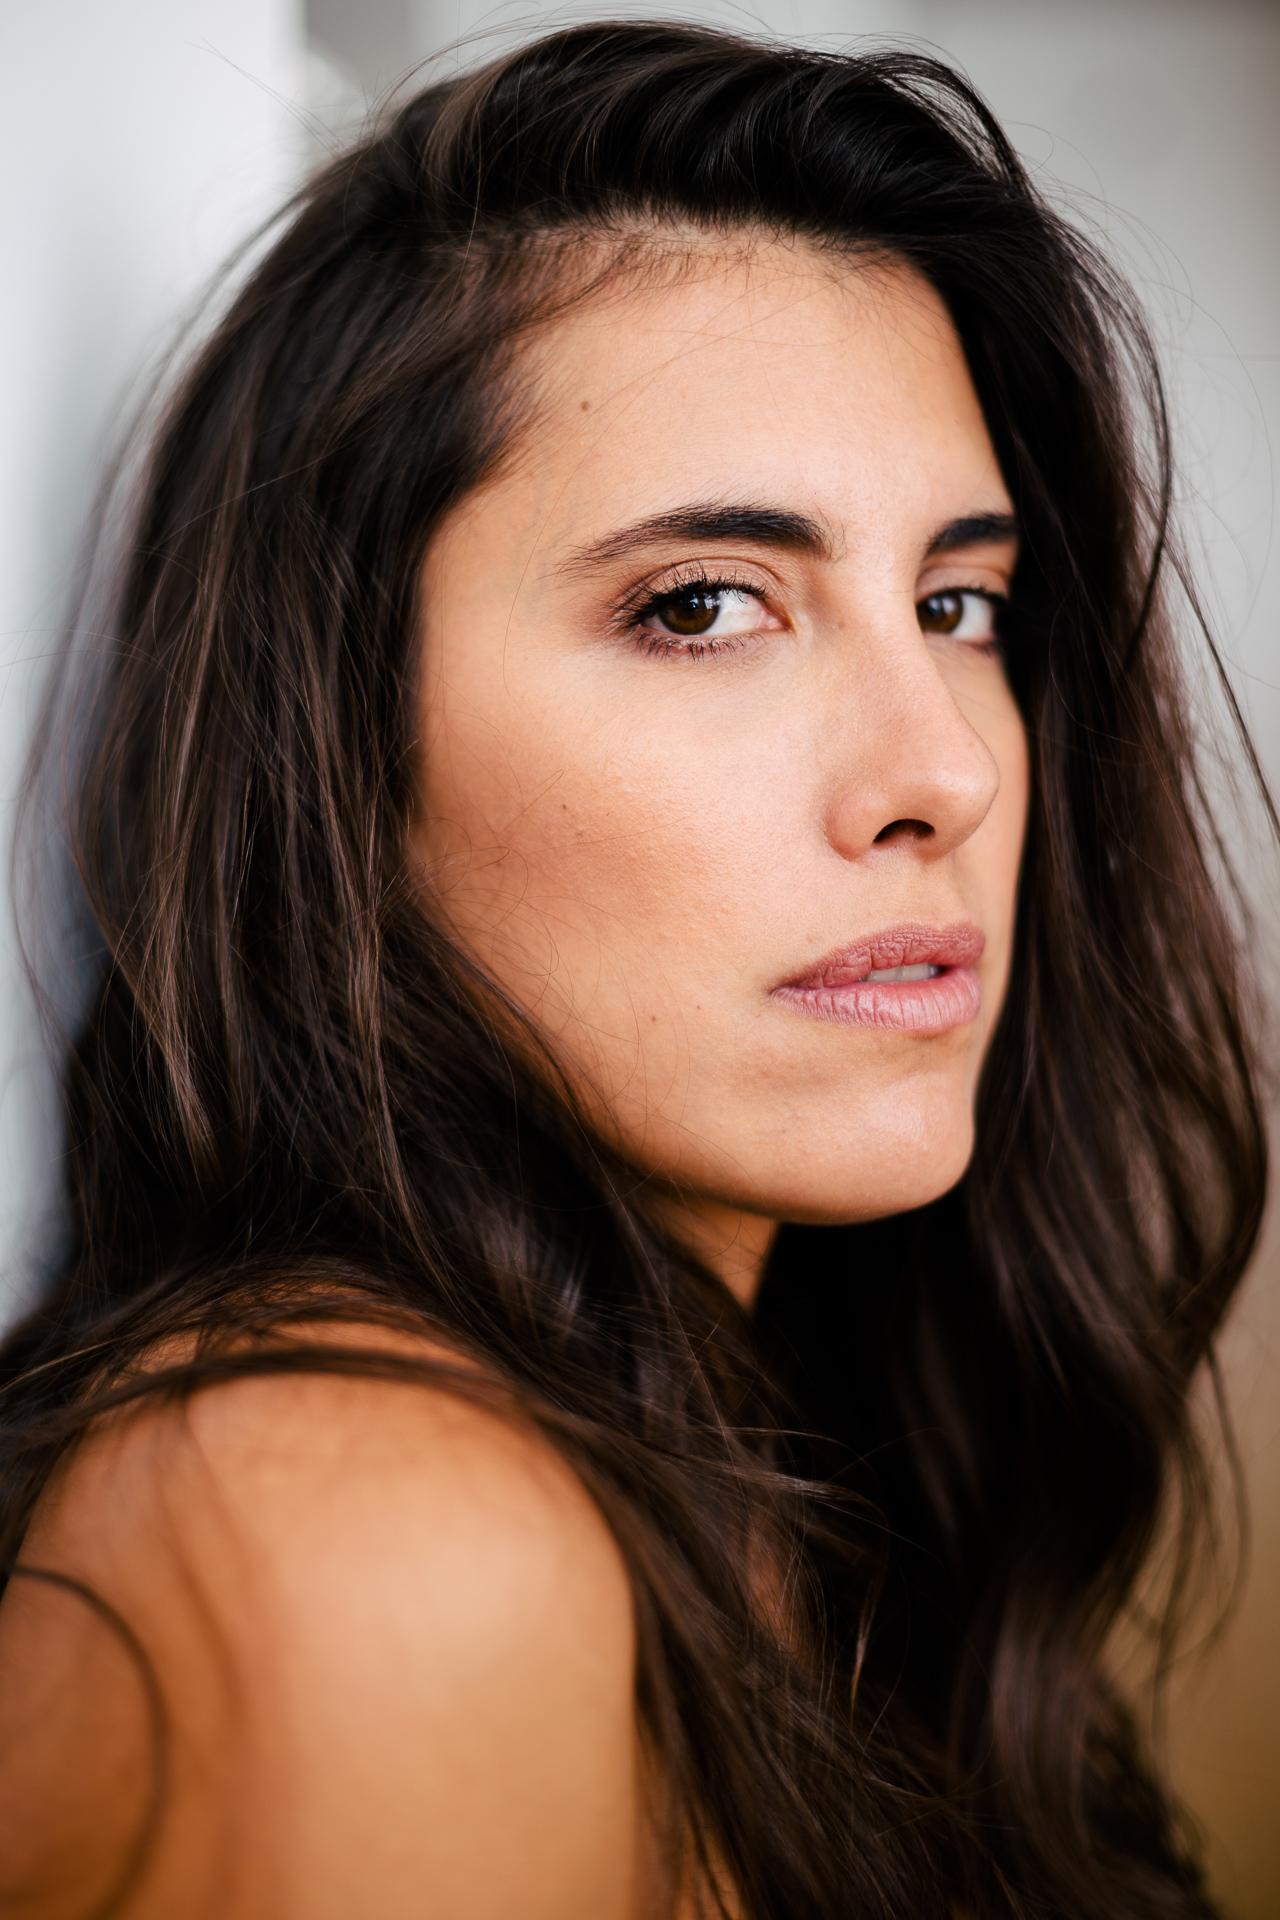 Maria Helena Campos Sobrancelha - Maria Helena Campos, da MH Studios